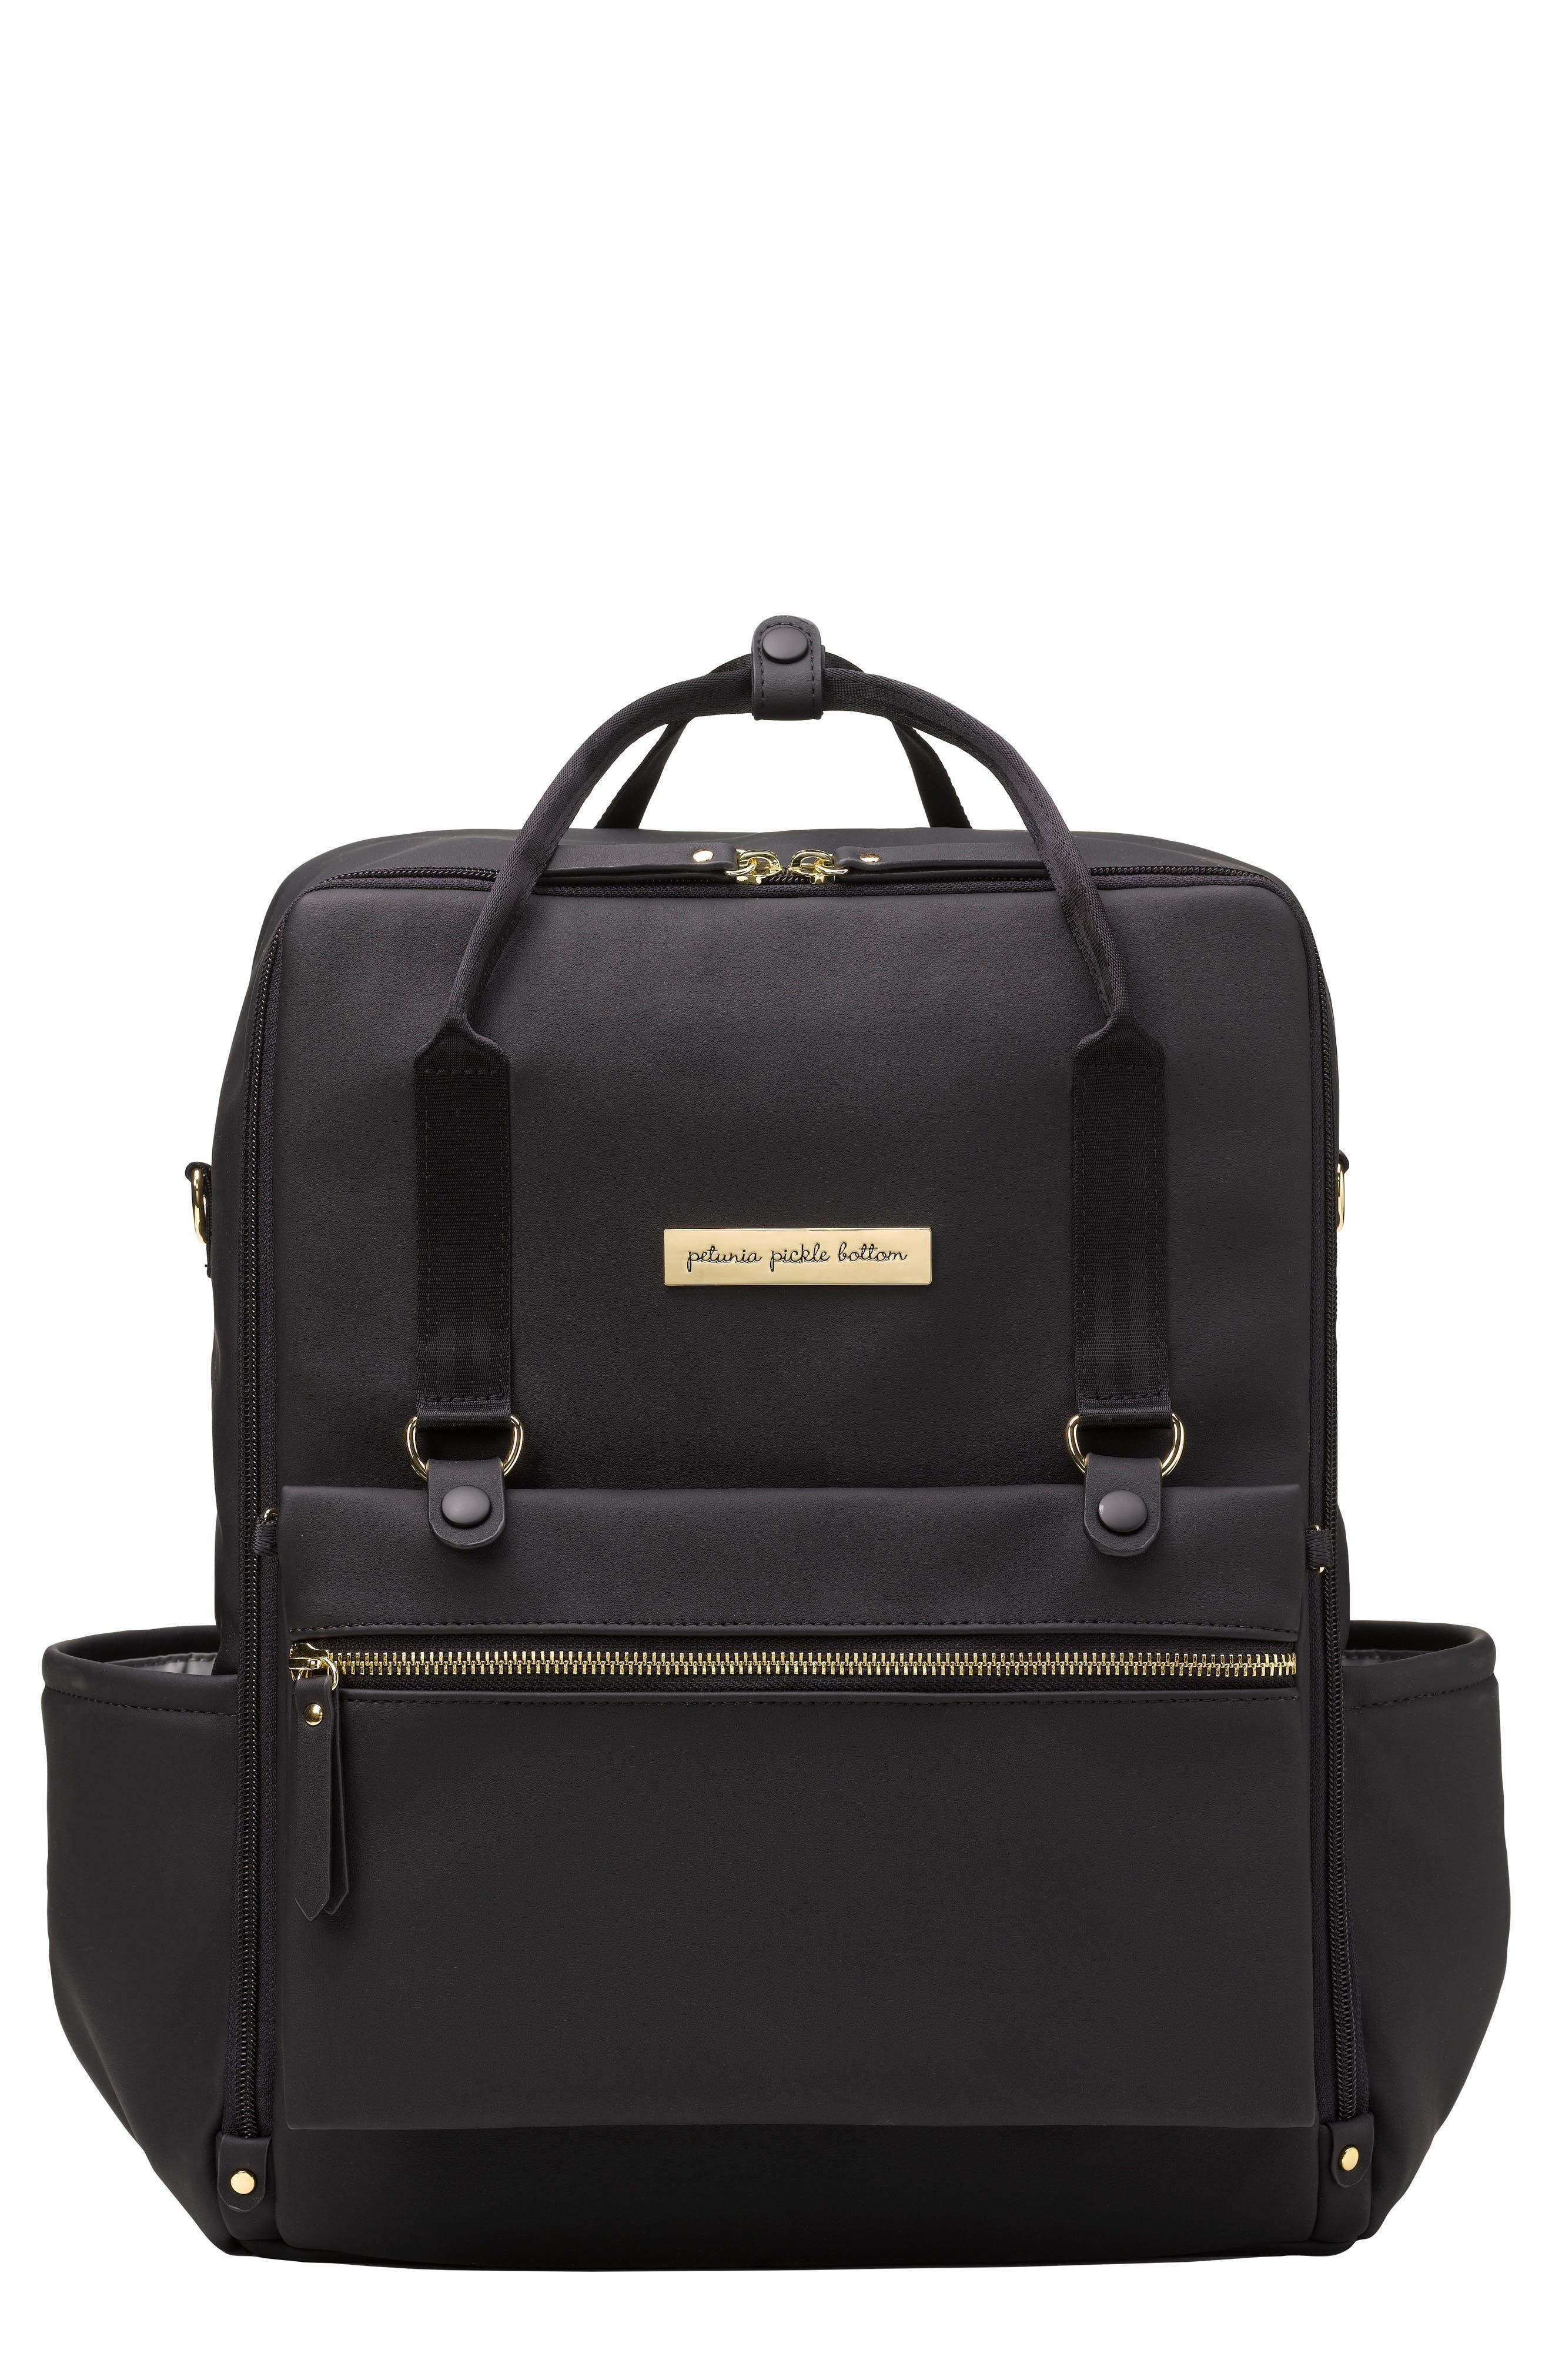 Balance Backpack Diaper Bag,                         Main,                         color, Black Matte Leatherette